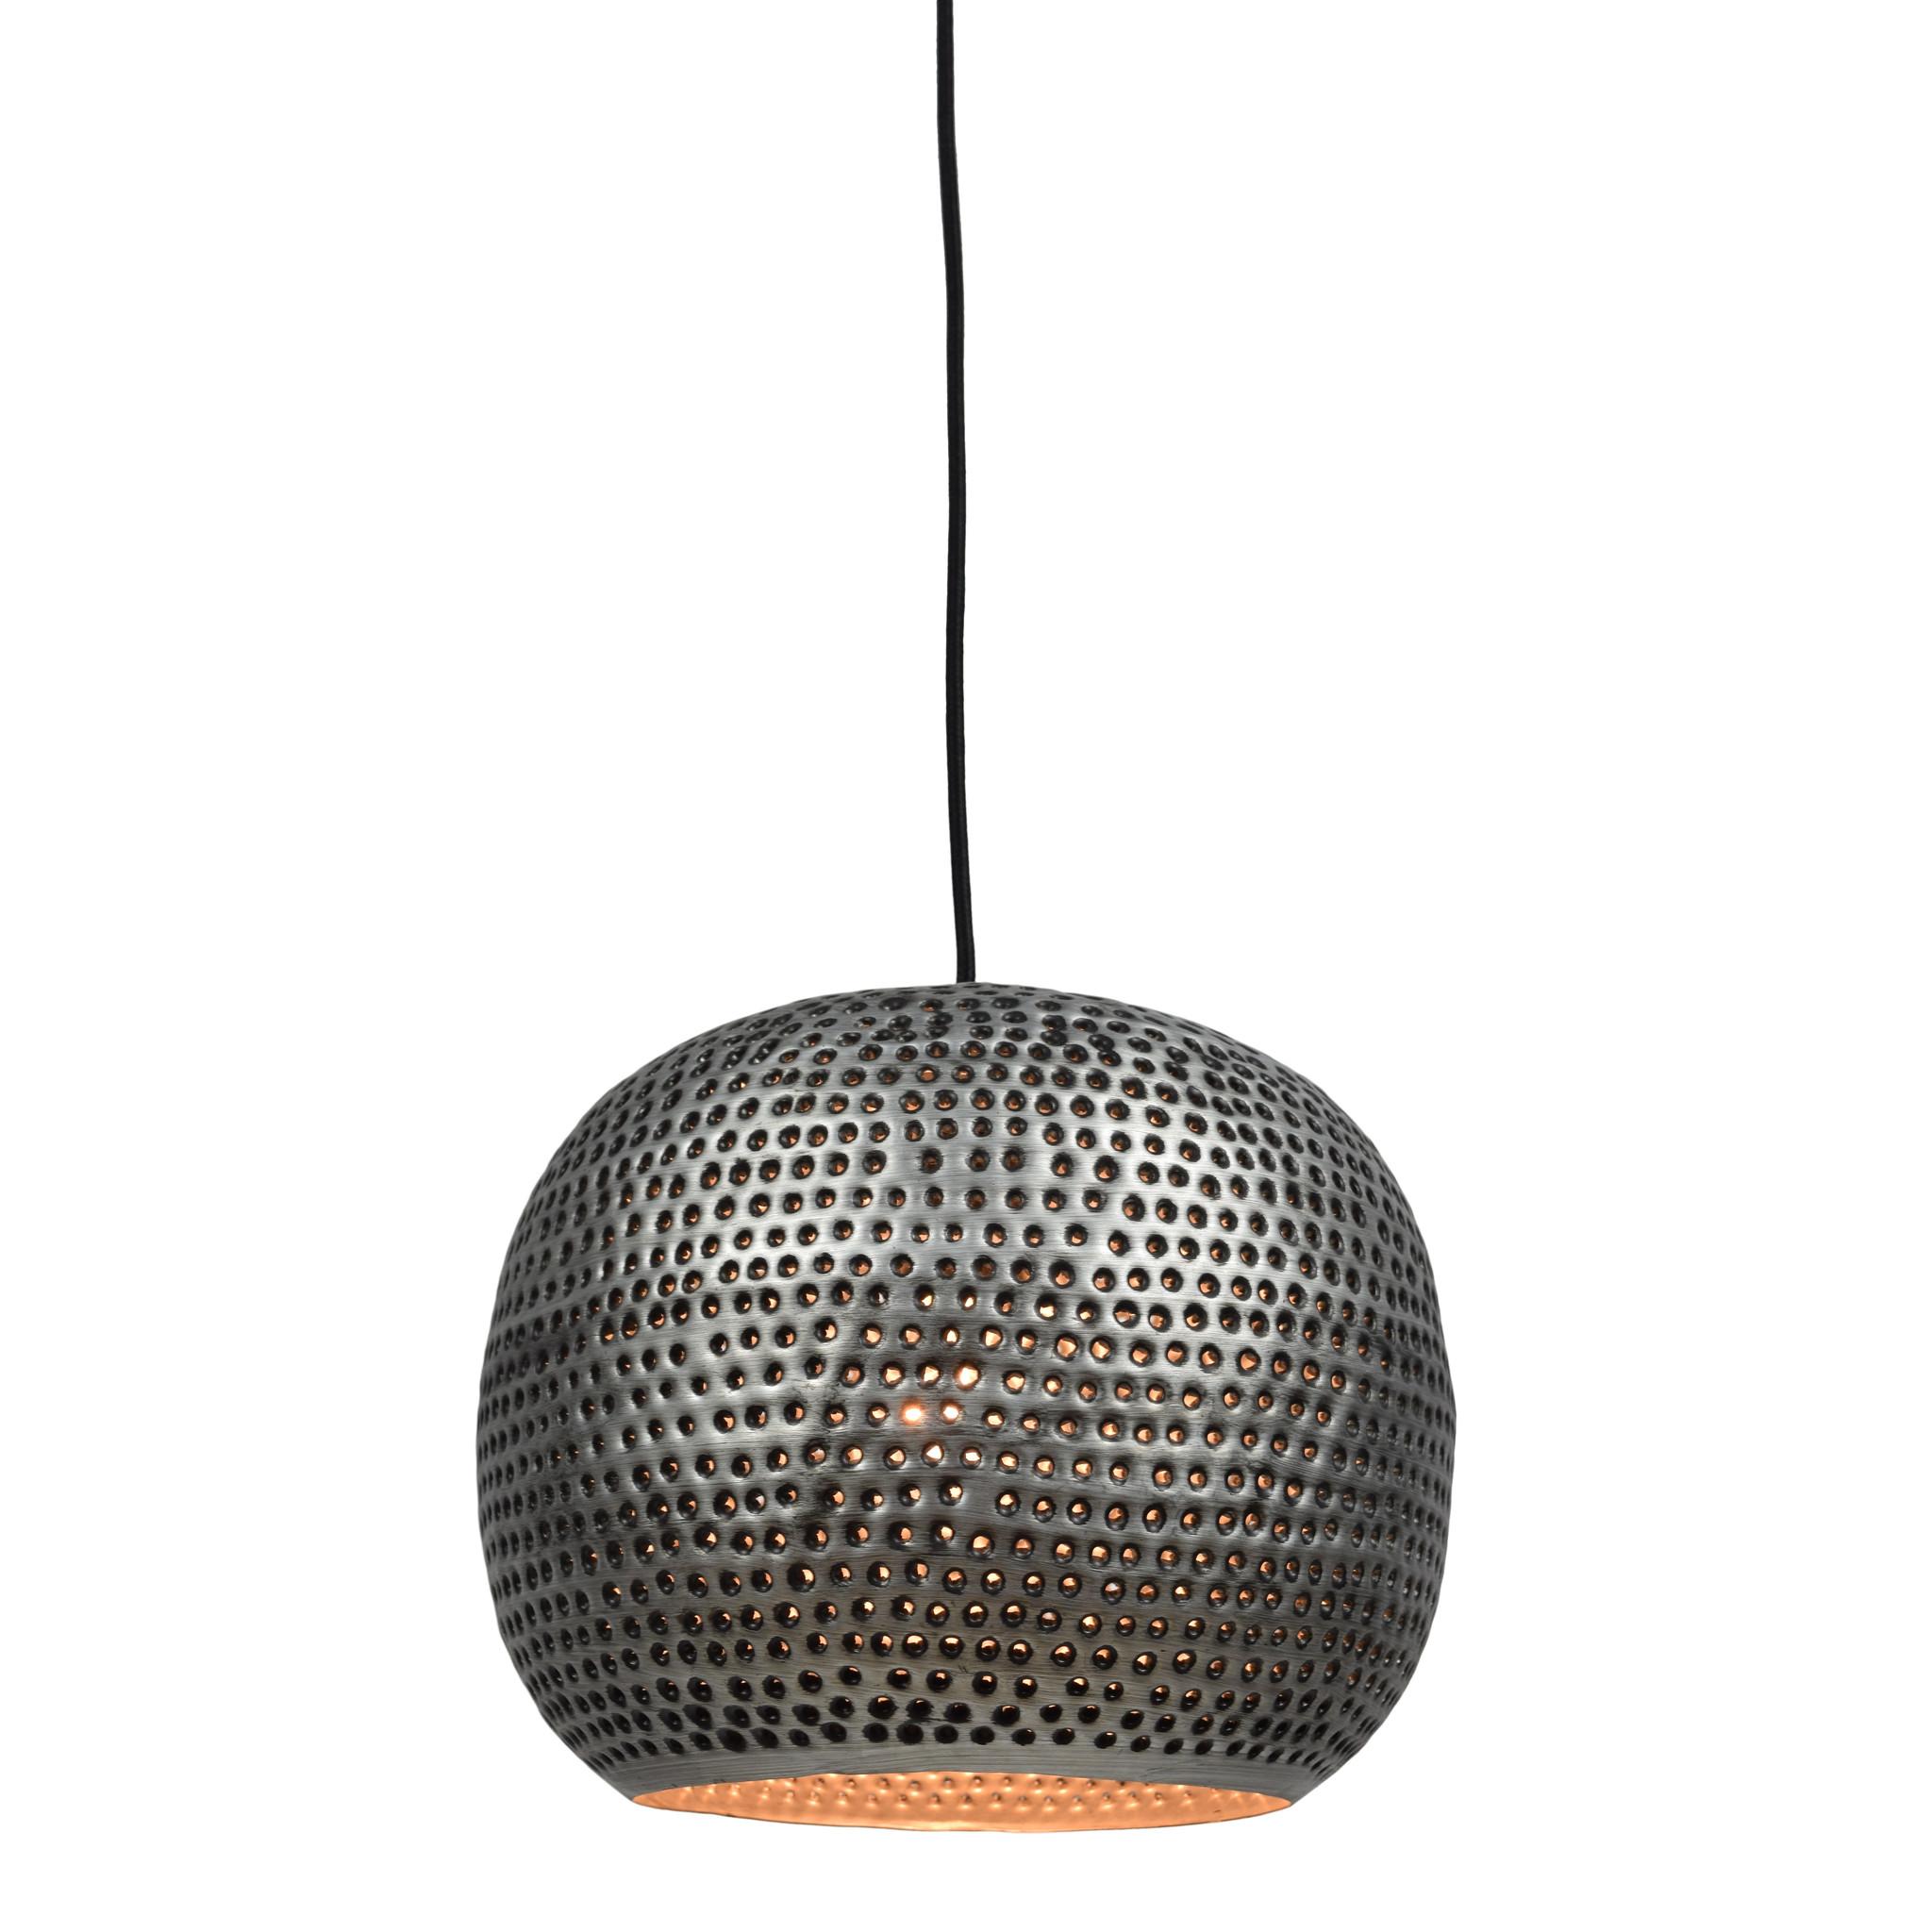 Urban Interiors Urban Interiors Hanglamp Spike bol ø27cm zink-AI-PL-002B-Z-8719325005943